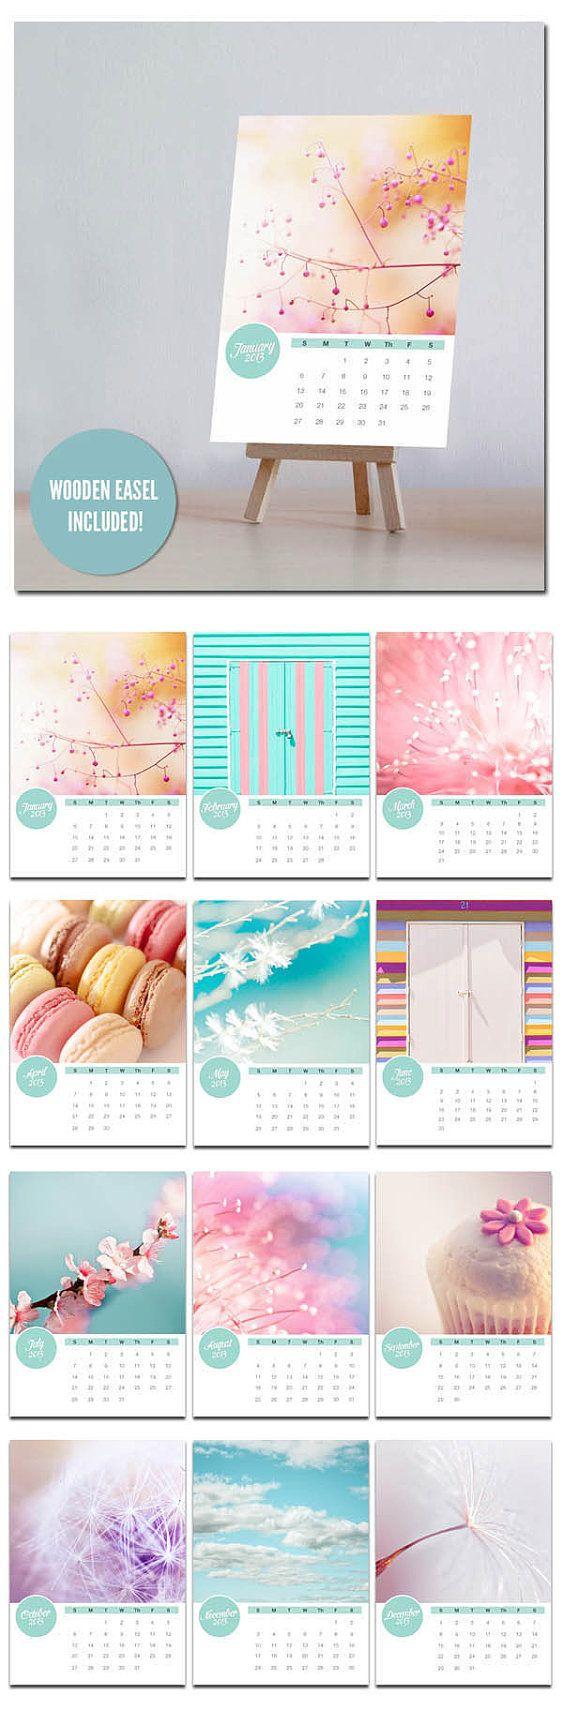 Photography calendar 2013  5x7 mini desk by mylittlepixels on Etsy, $22.00